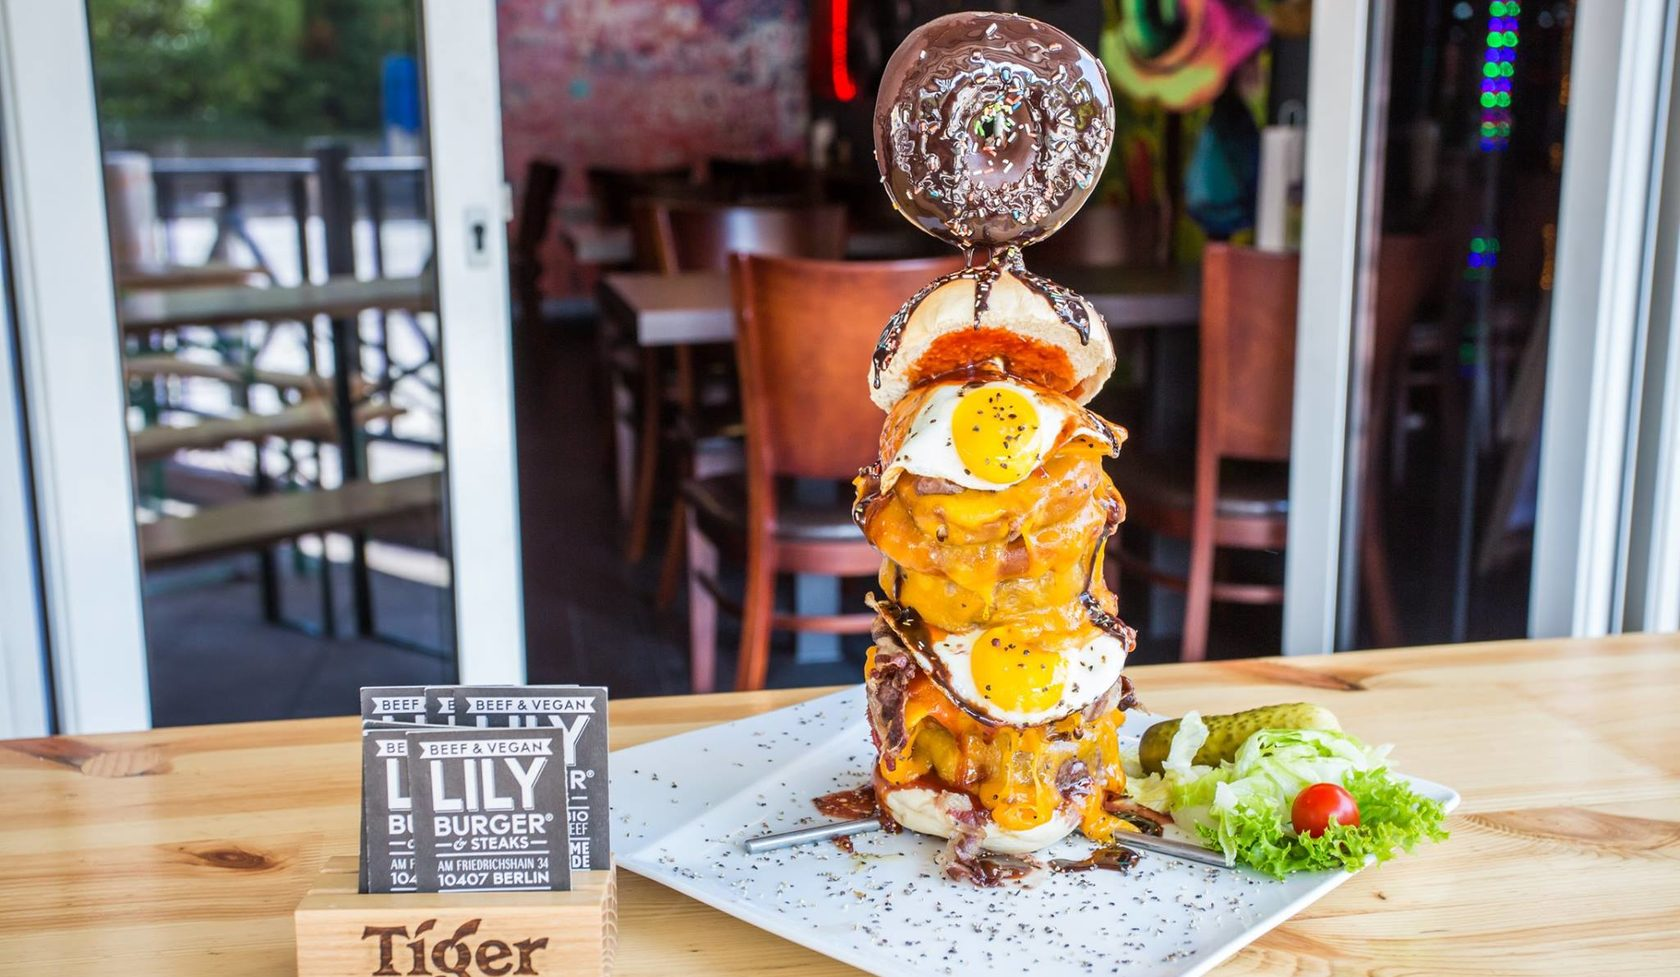 lily burger steaks beef vegan grill club restaurant in berlin friedrichshain neuk lln. Black Bedroom Furniture Sets. Home Design Ideas